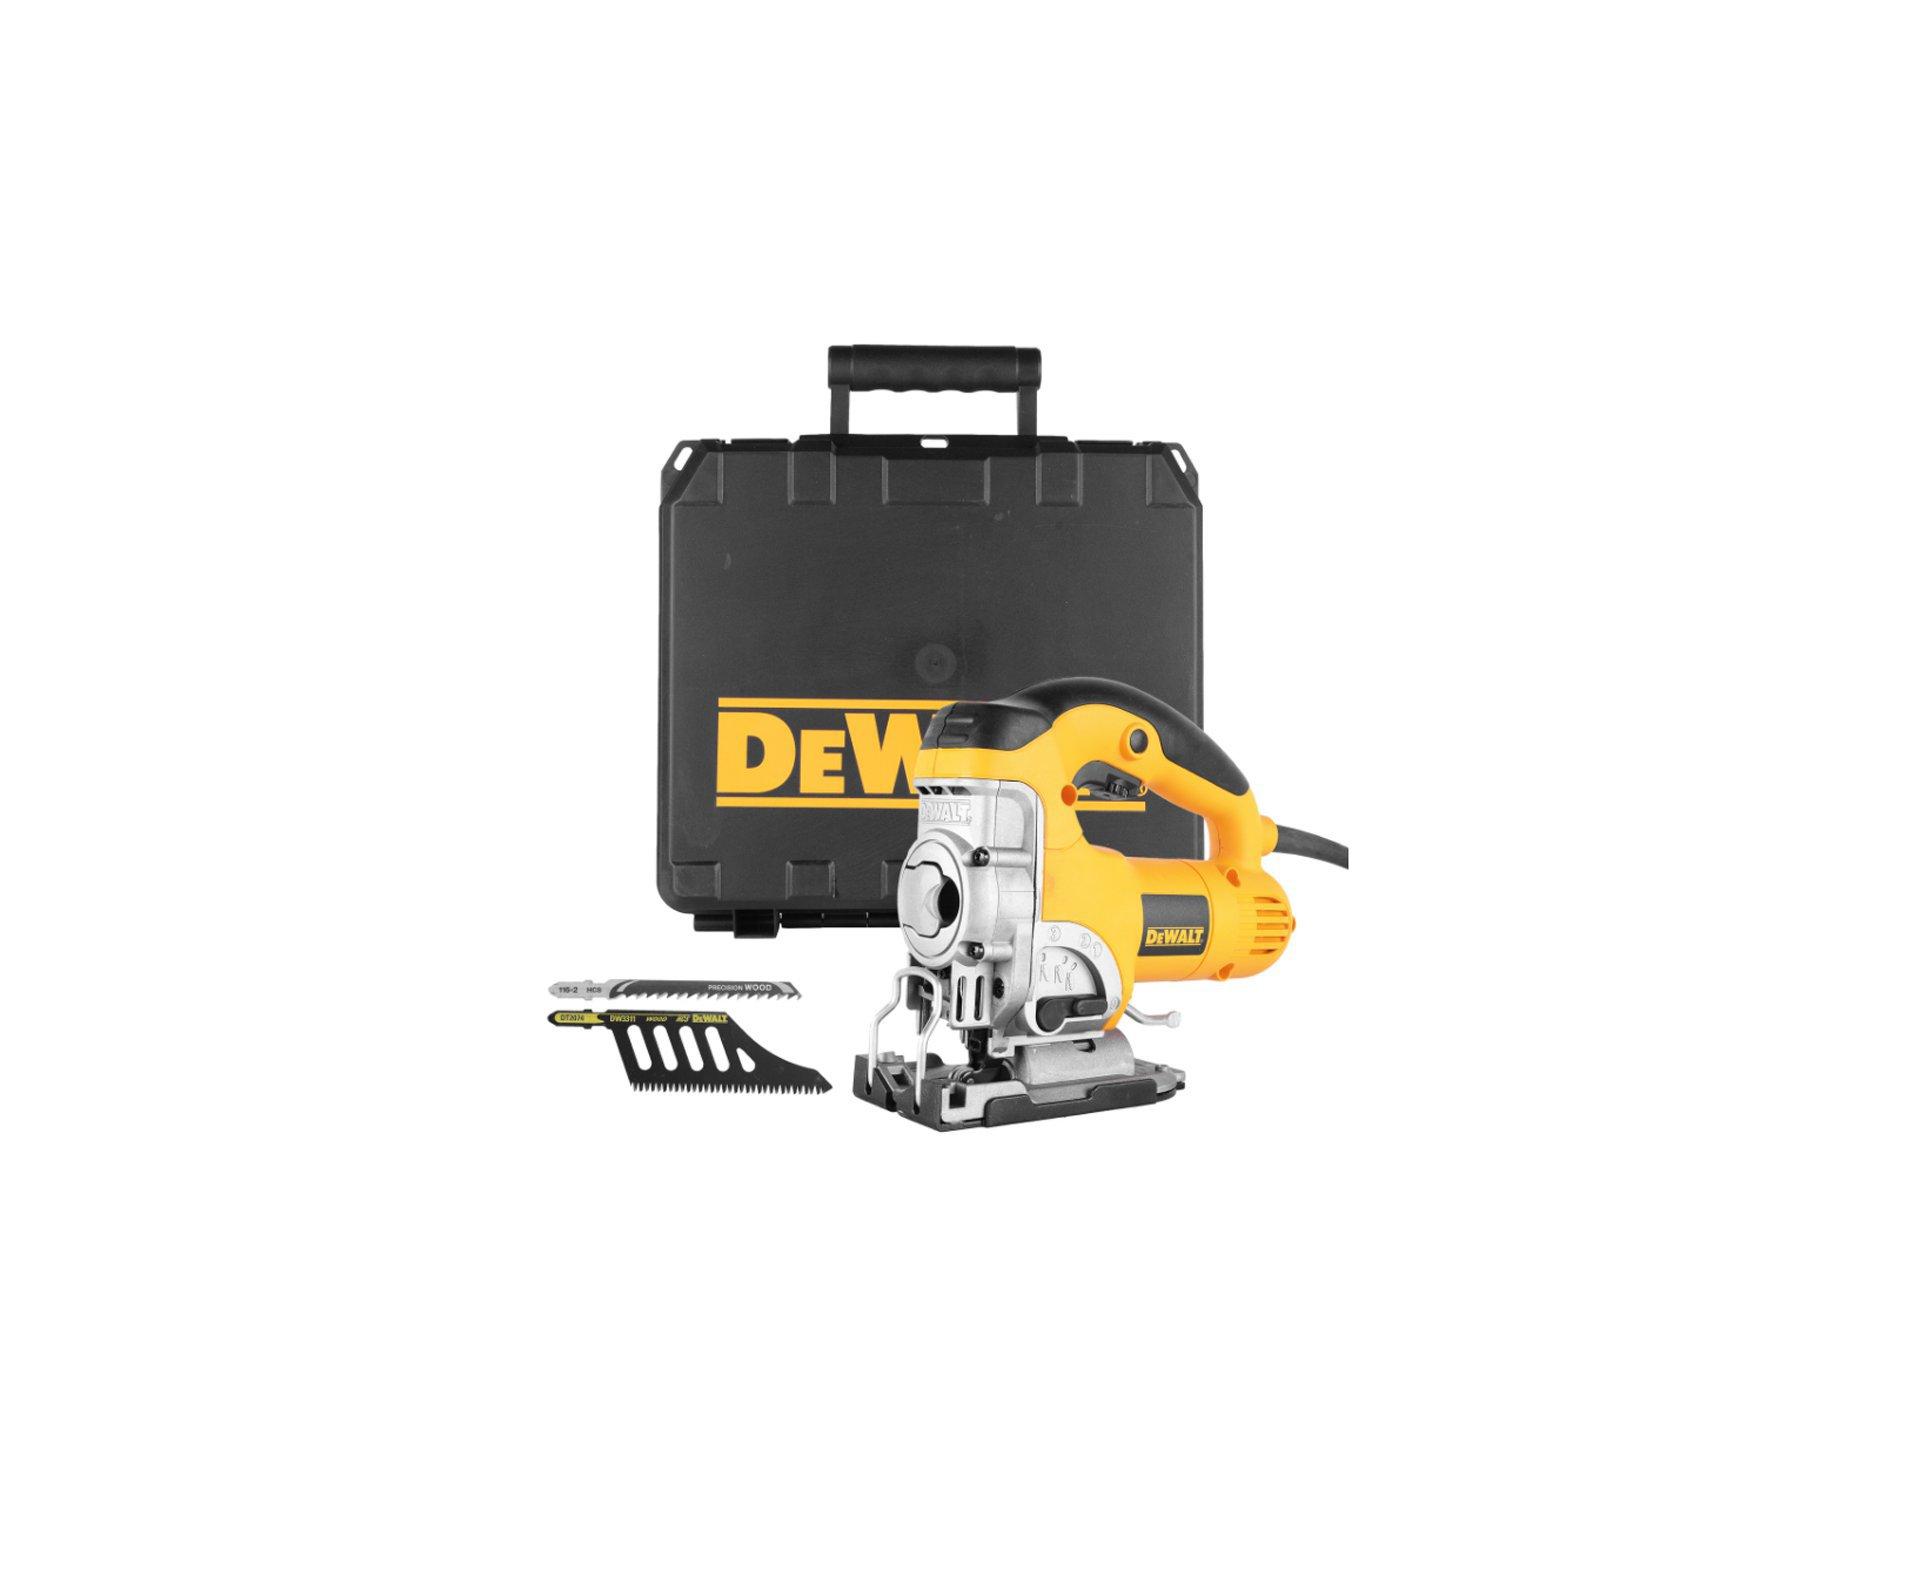 Serra Tico-tico Dewalt Dw331k 220v 50-60hz